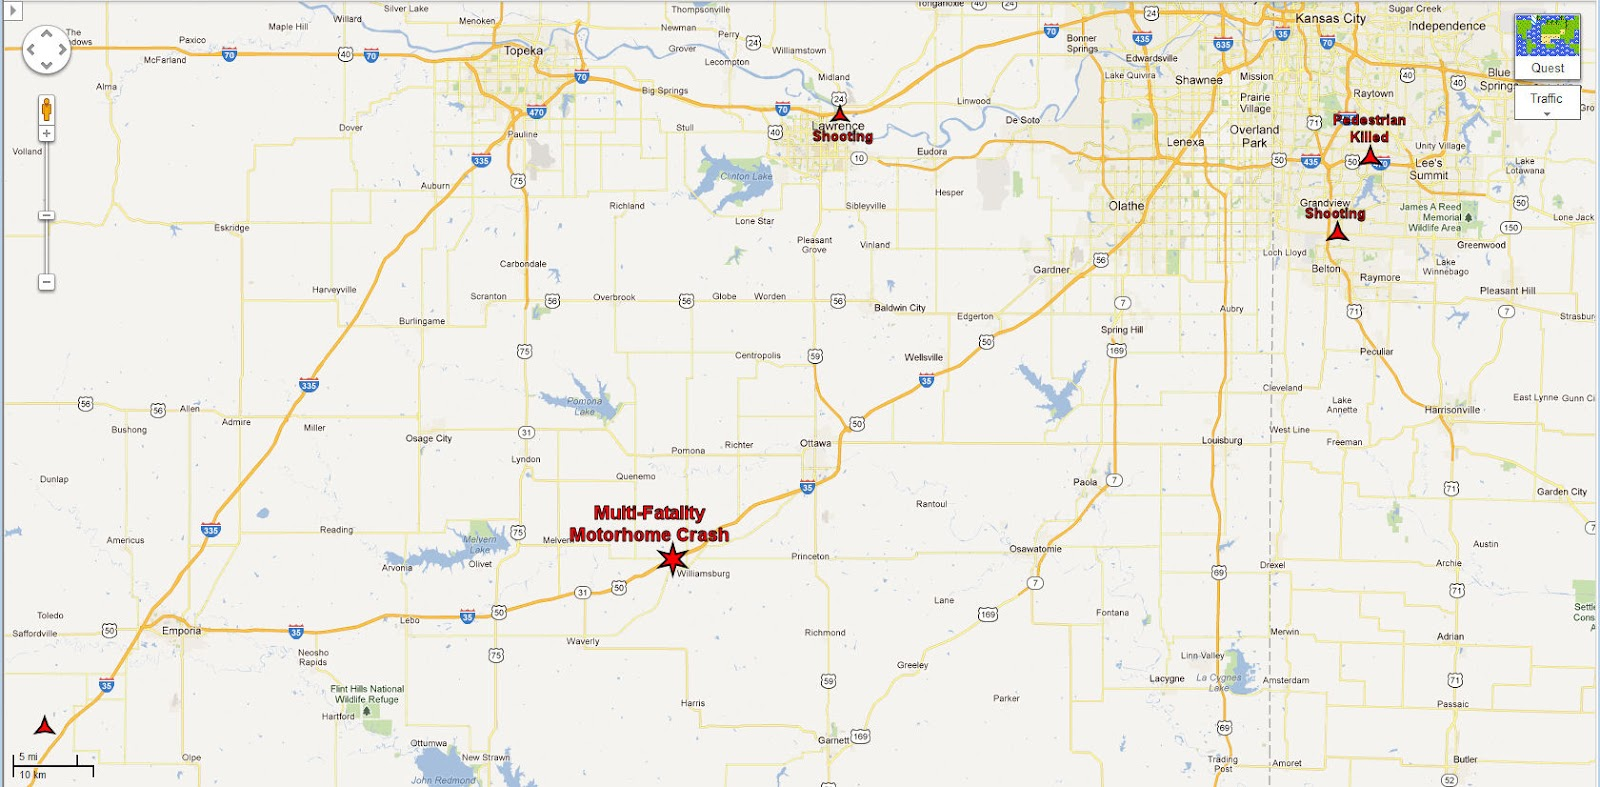 Capt  Spaulding's World: Five Killed in Crash on I-35 in